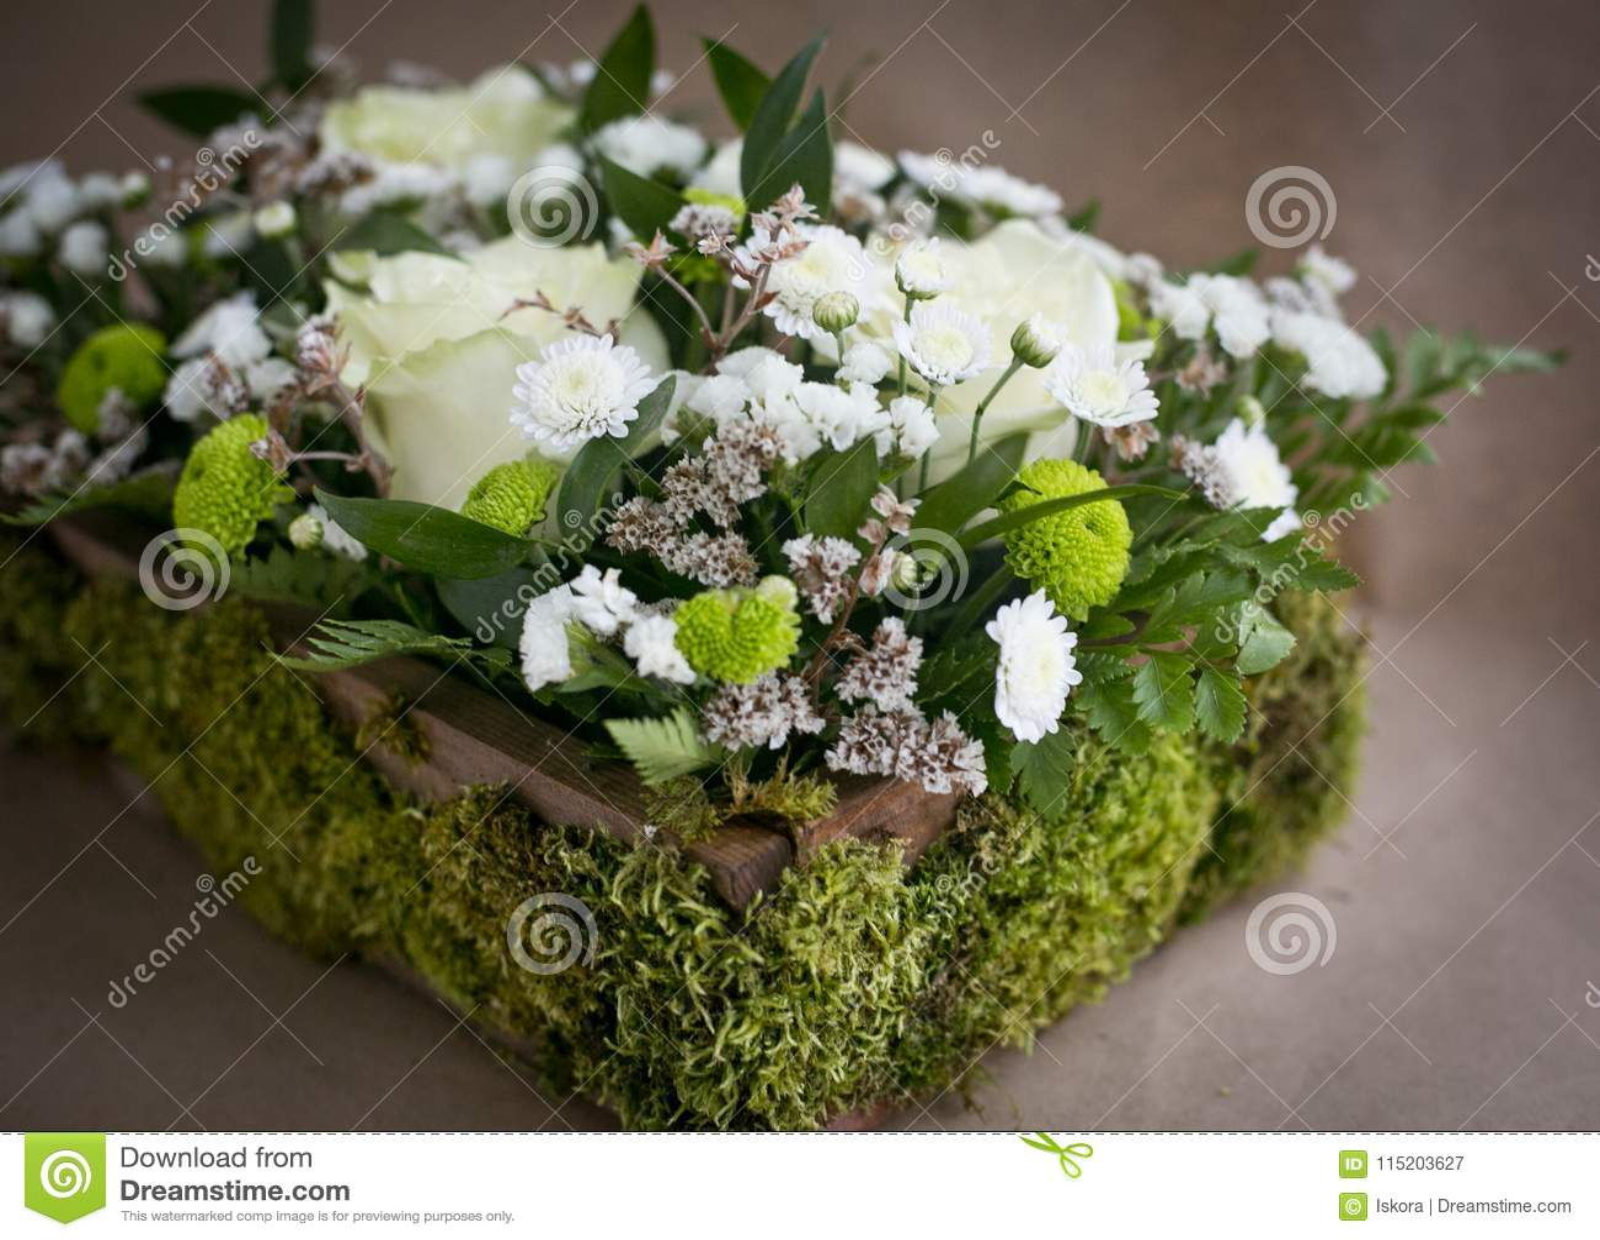 Flower Arrangement In A Box Stock Image Image Of Chamomilen Flower 115203627